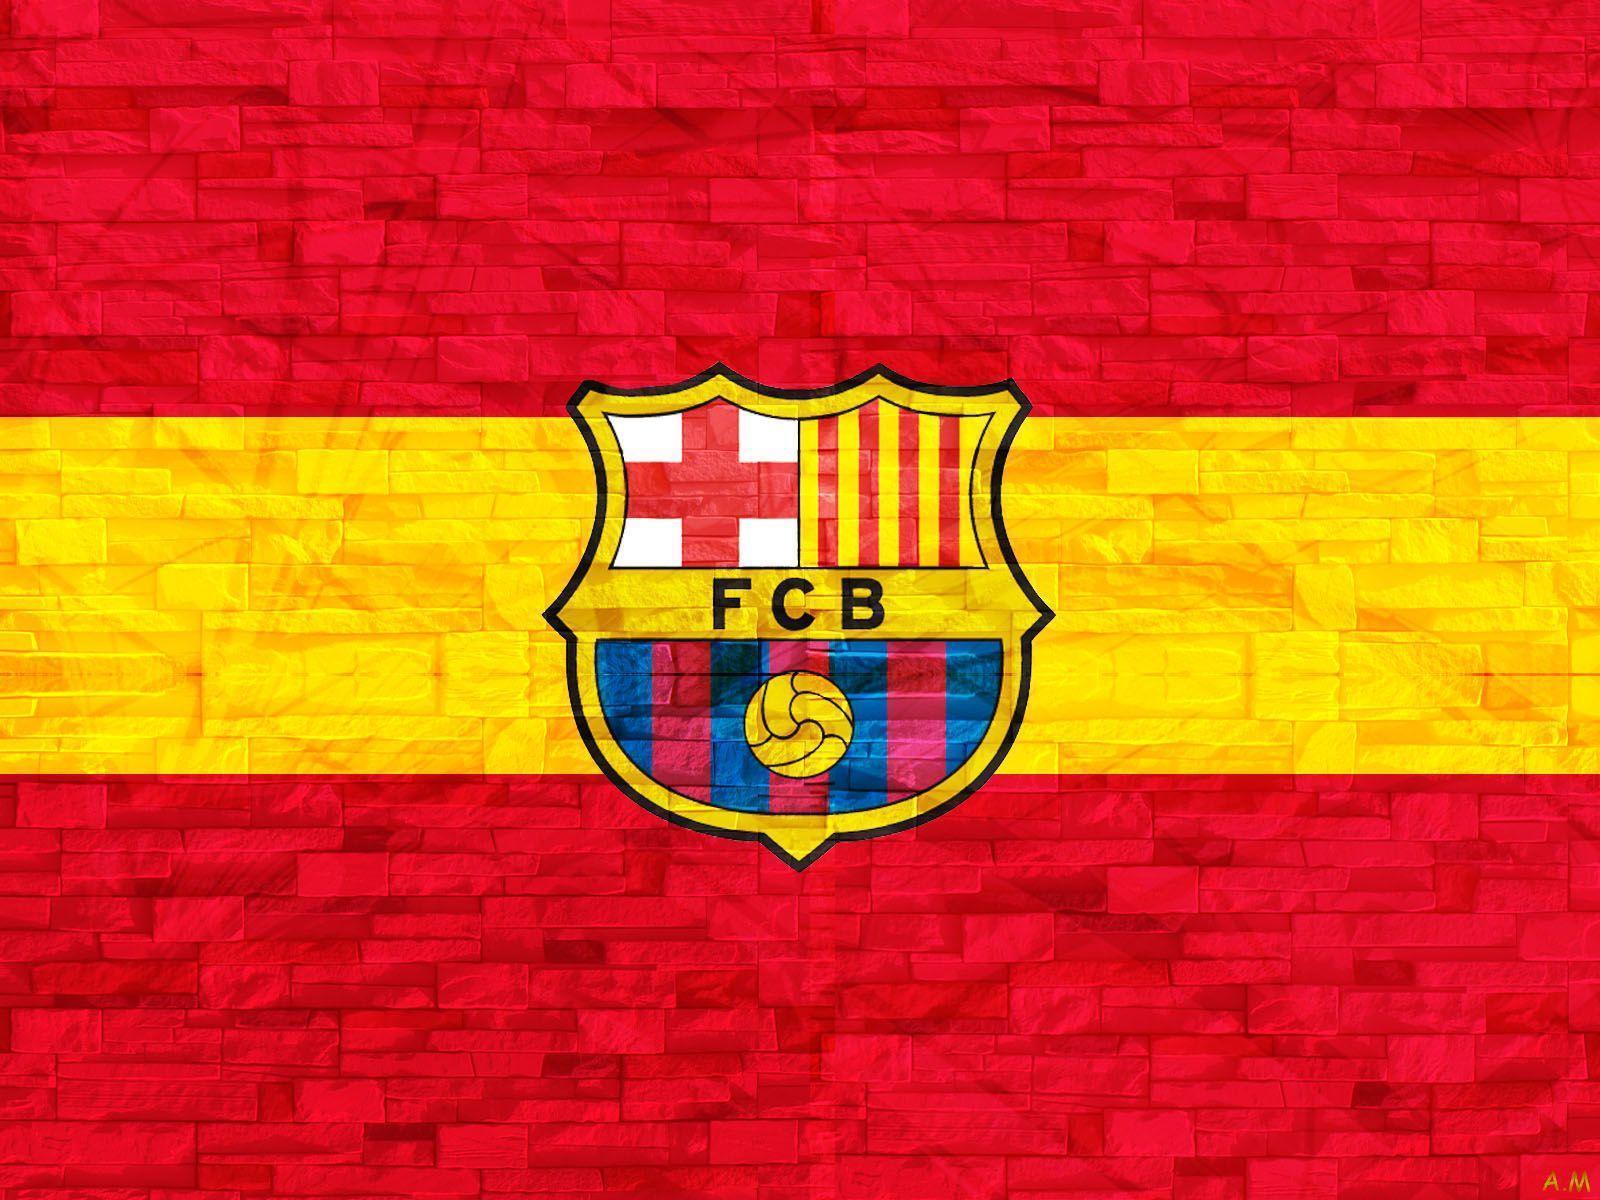 HD FC Barcelona Wallpaper - WallpaperSafari